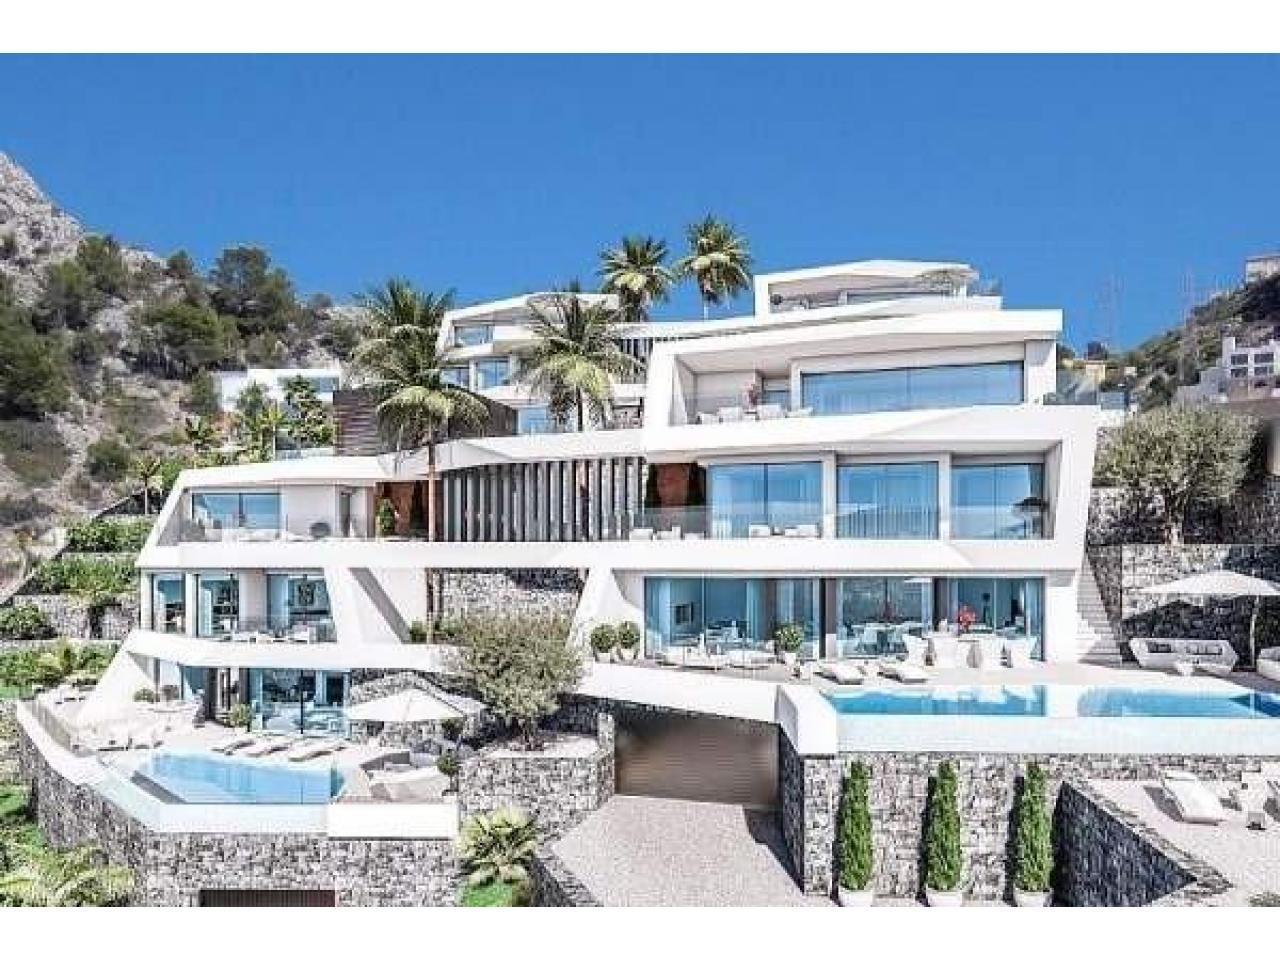 Недвижимость в Испании, Новая вилла с видами на море от застройщика в Альтеа,Коста Бланка,Испания - 1